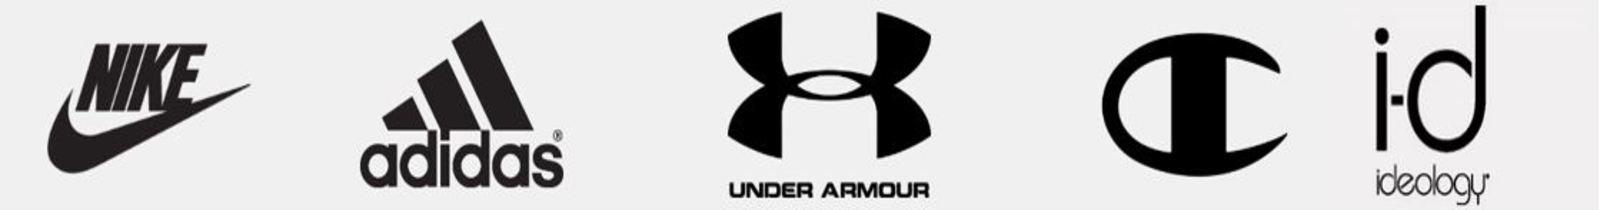 Nike, adidas, Under Armour, champion, ideology